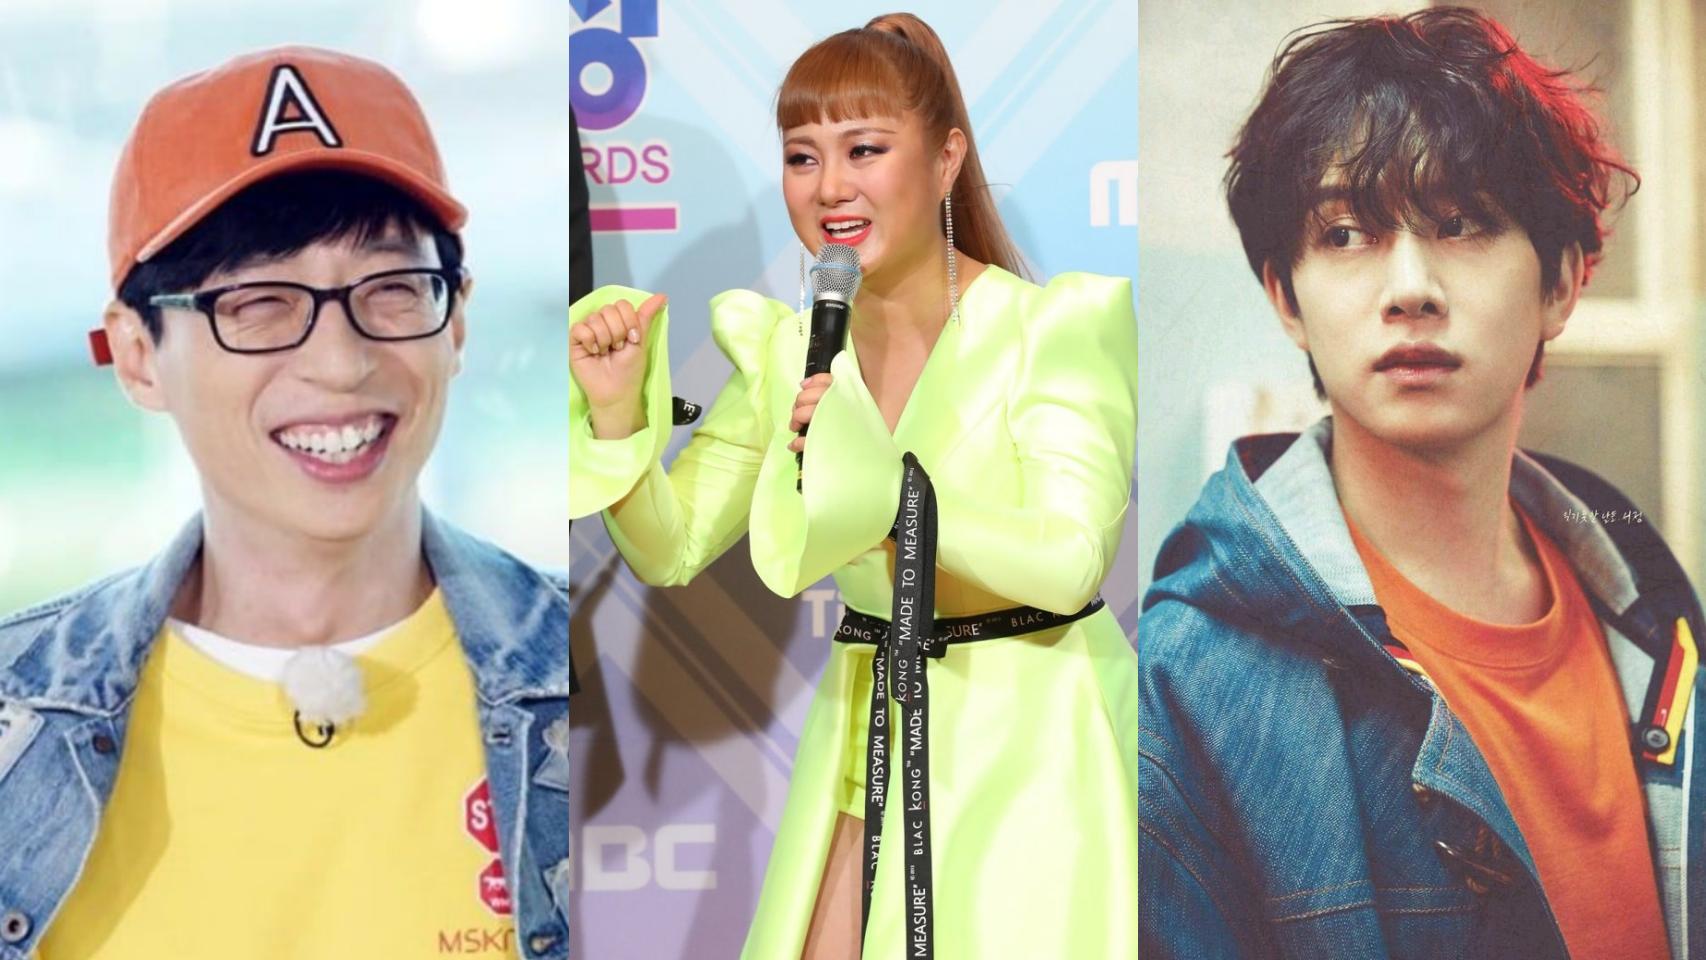 List of The Highest Brand Reputation of Korean Variety Show Stars in October 2020